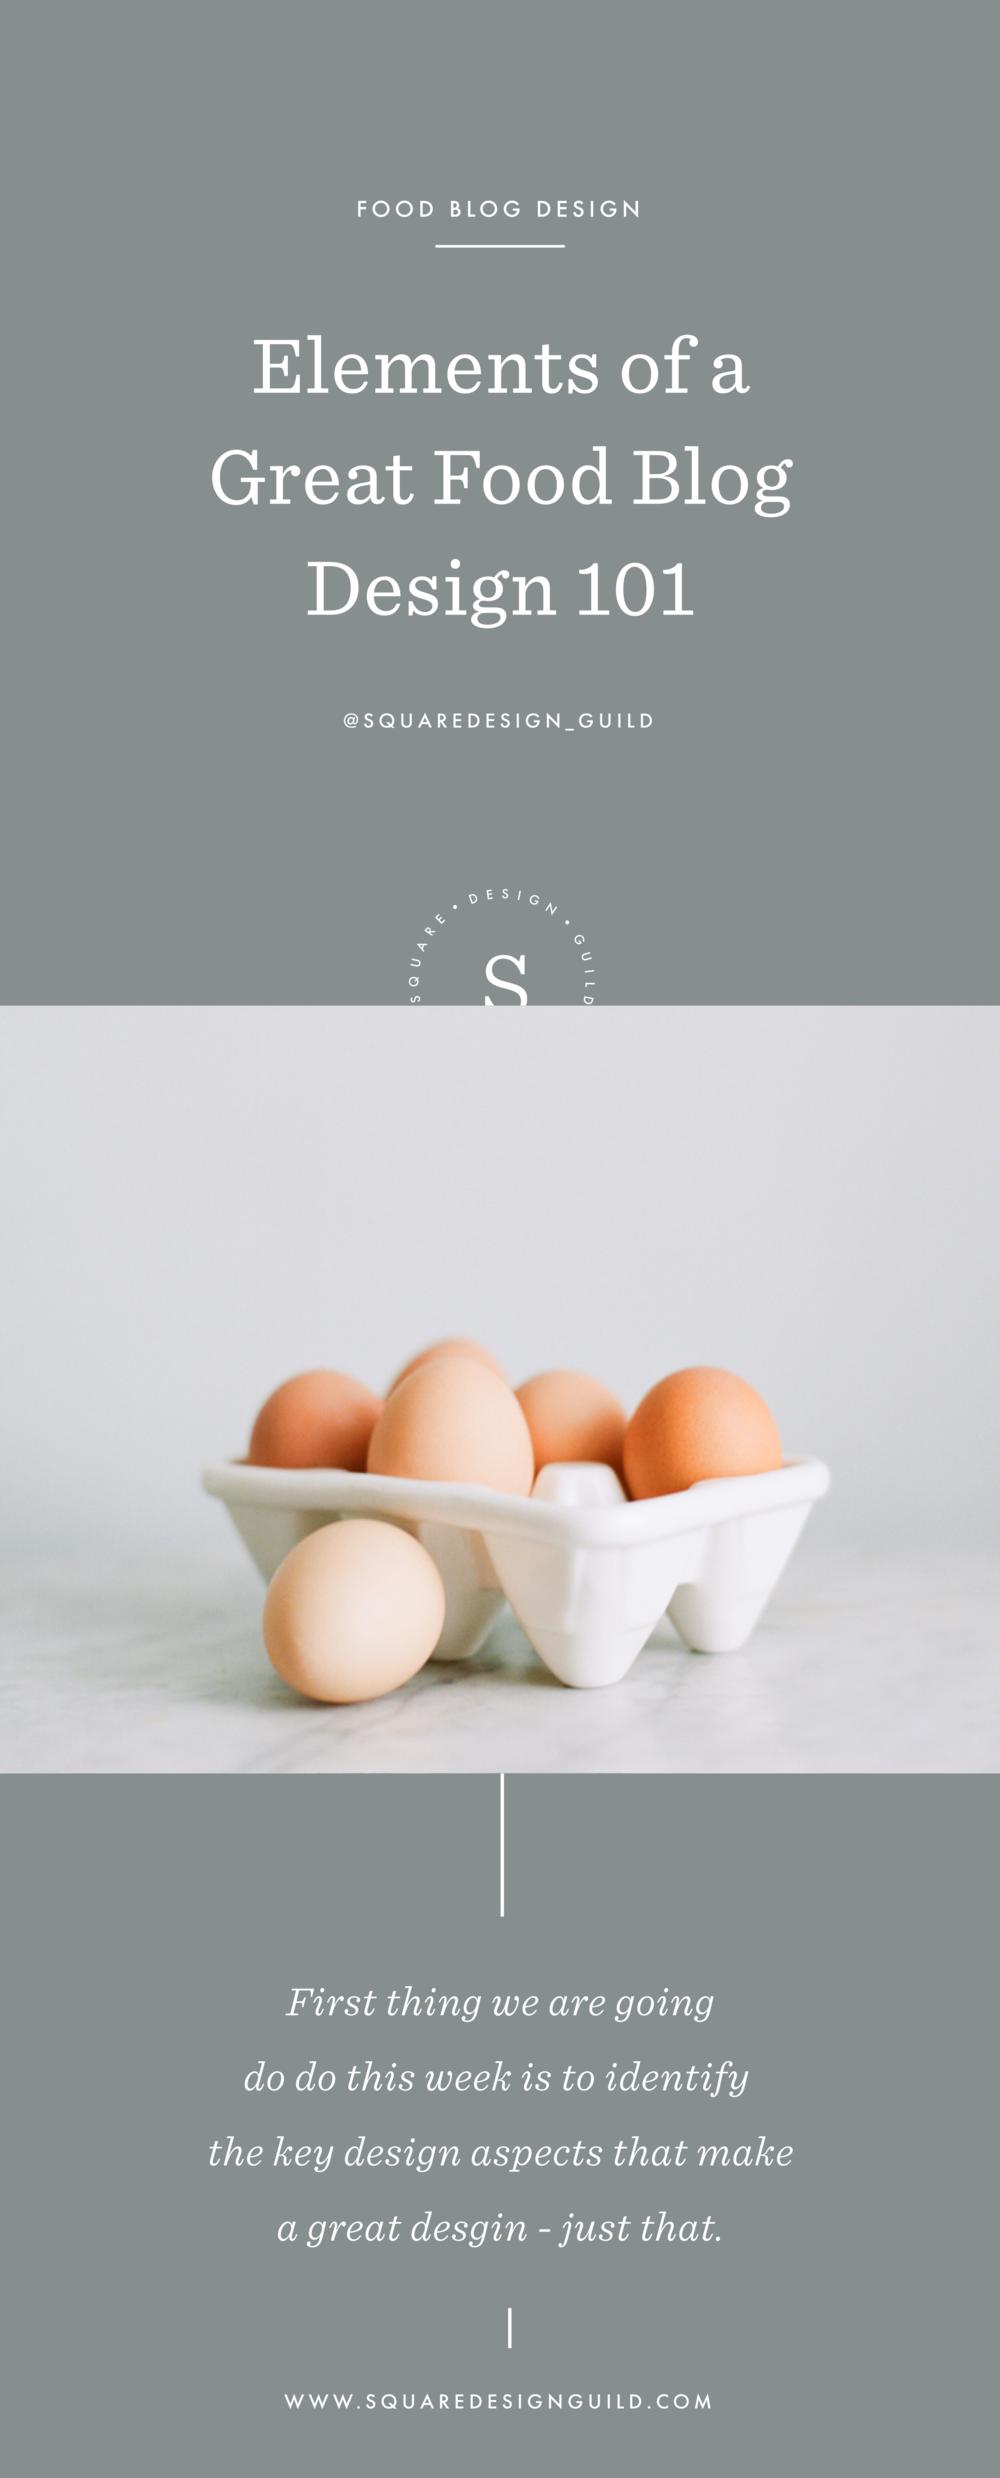 Food Blogging Design on Squarespace